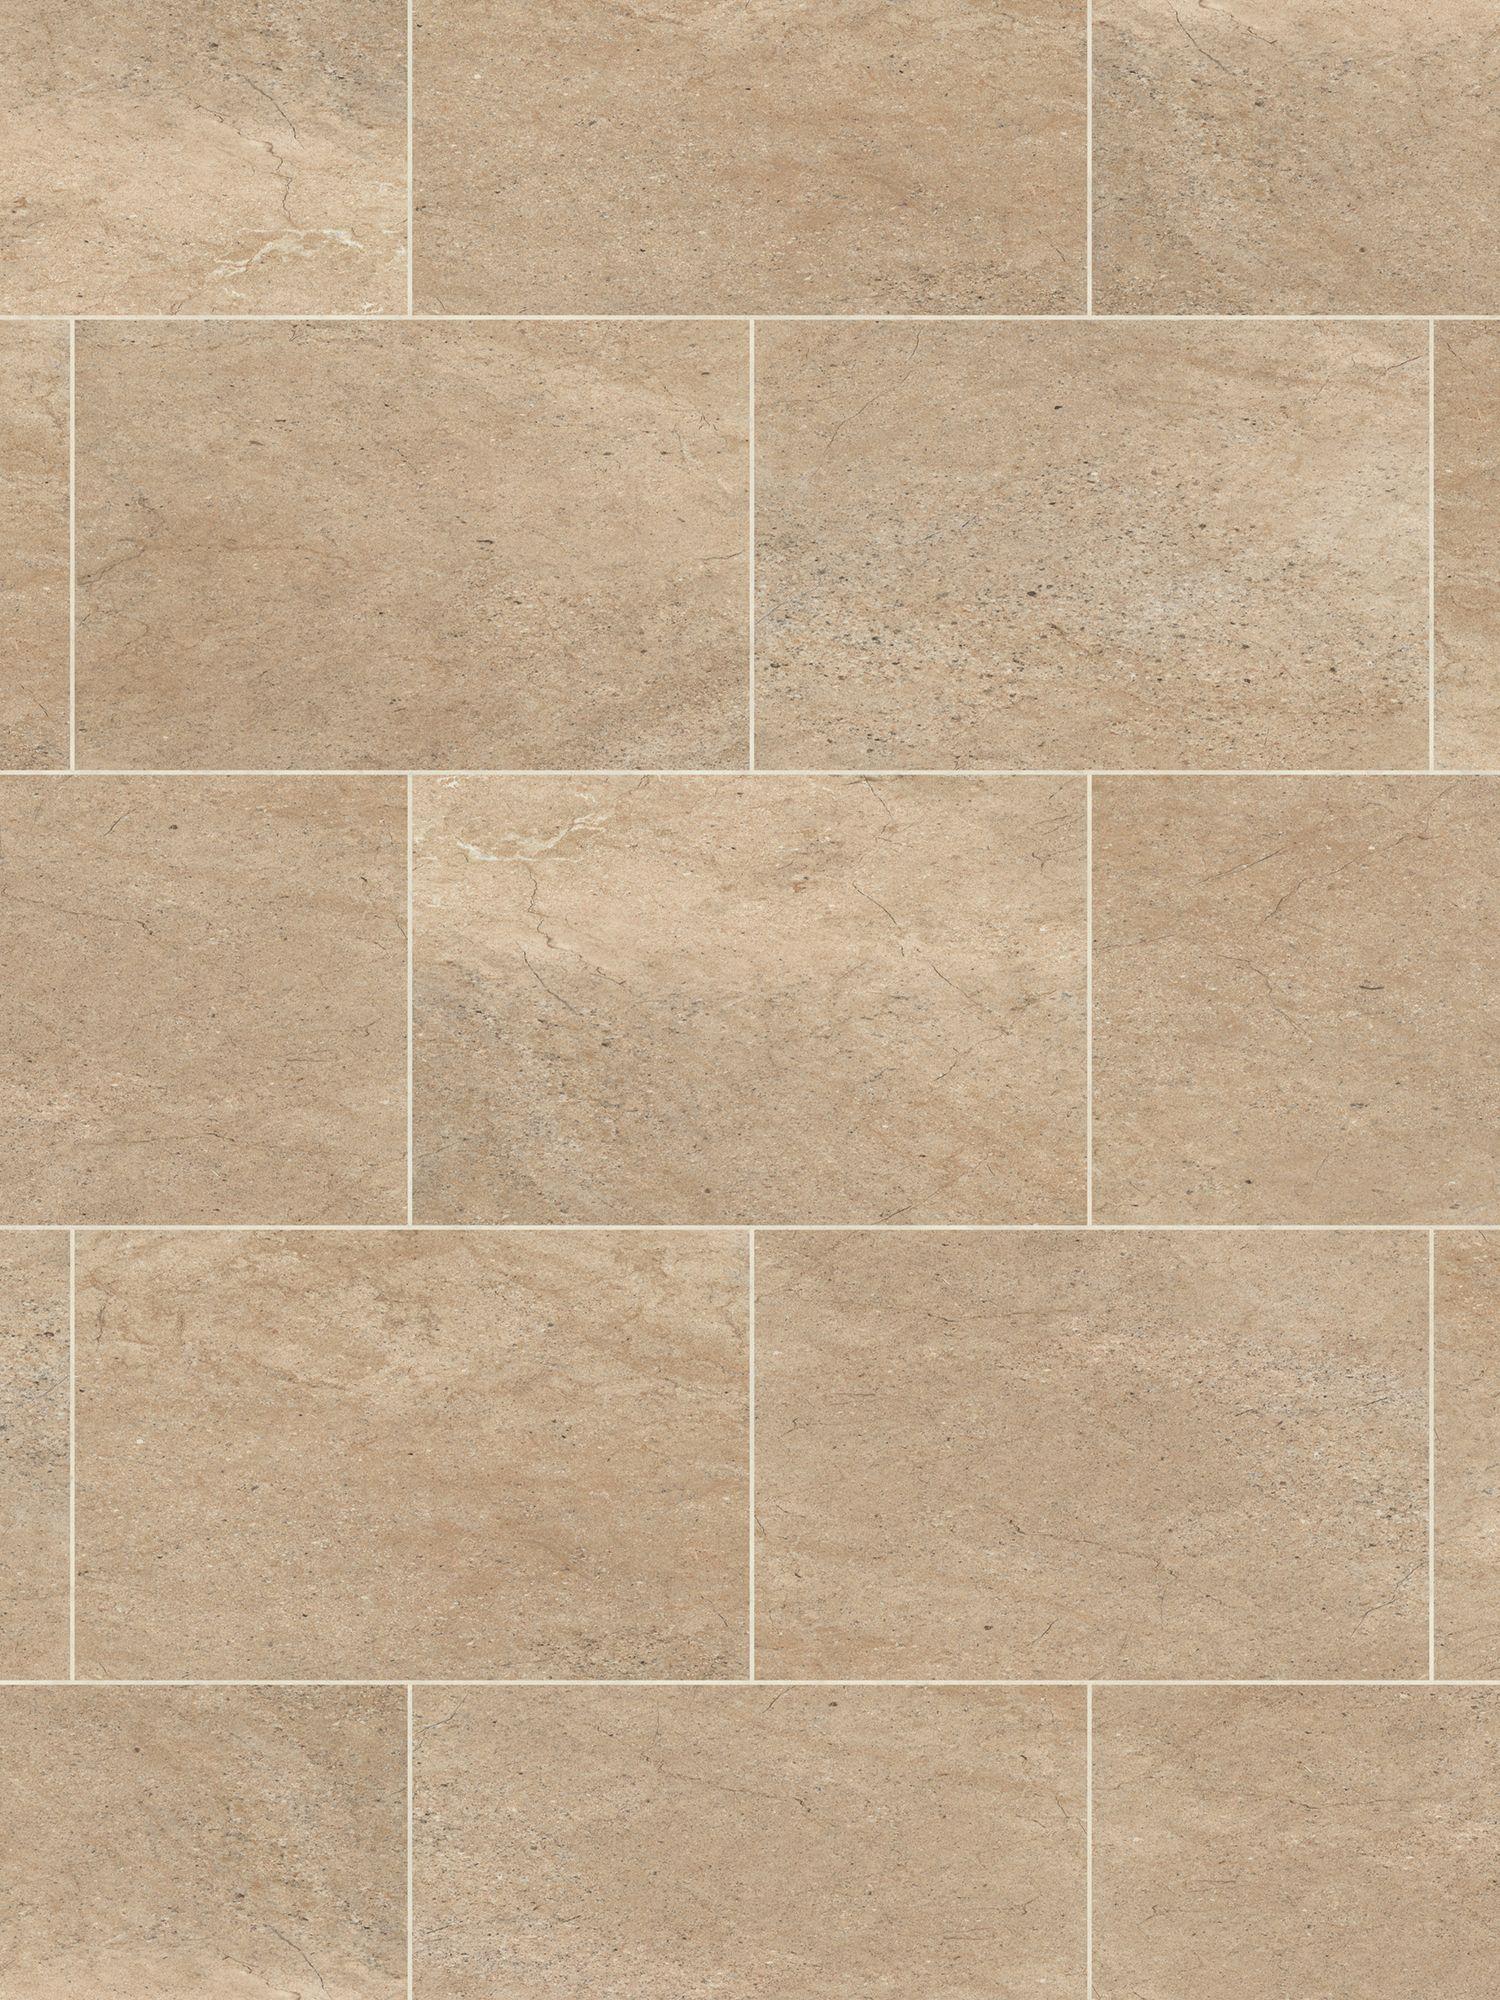 Karndean Karndean Knight Tile Stone Vinyl Flooring